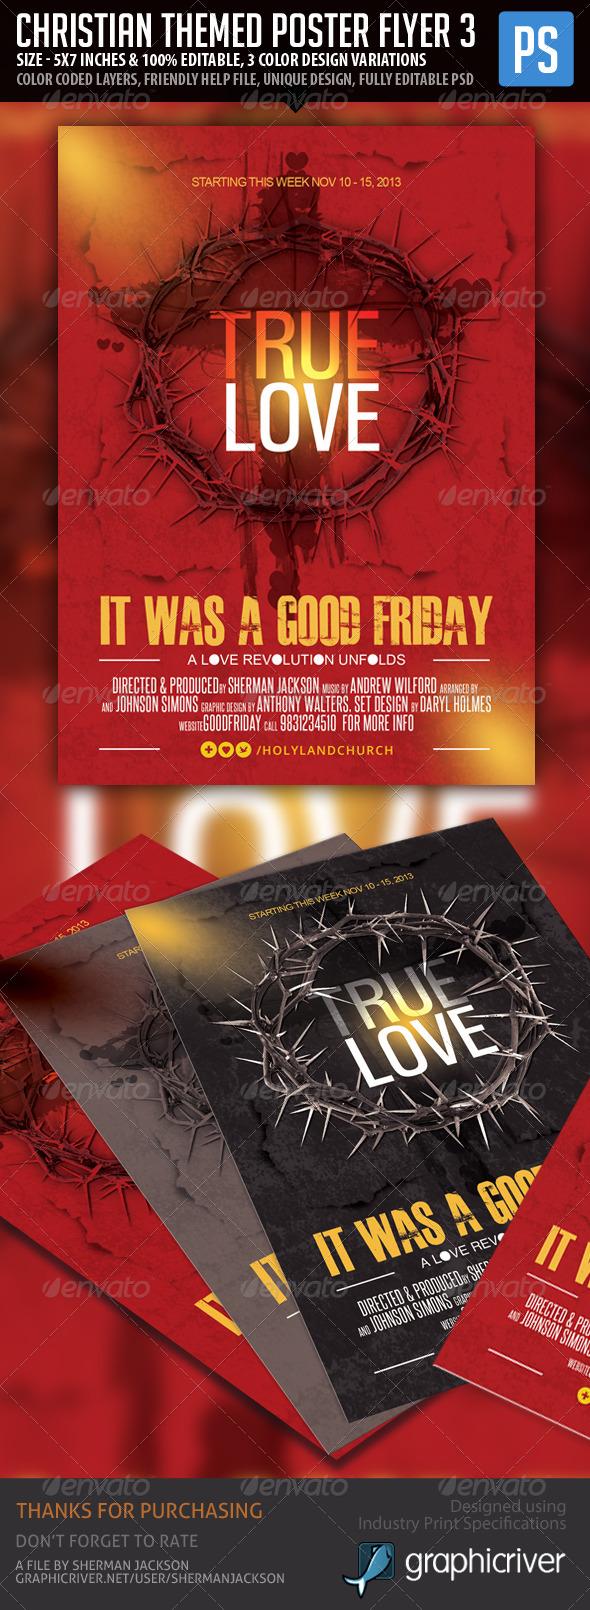 Church/Christian Themed Poster/Flyer Vol.2 - Church Flyers